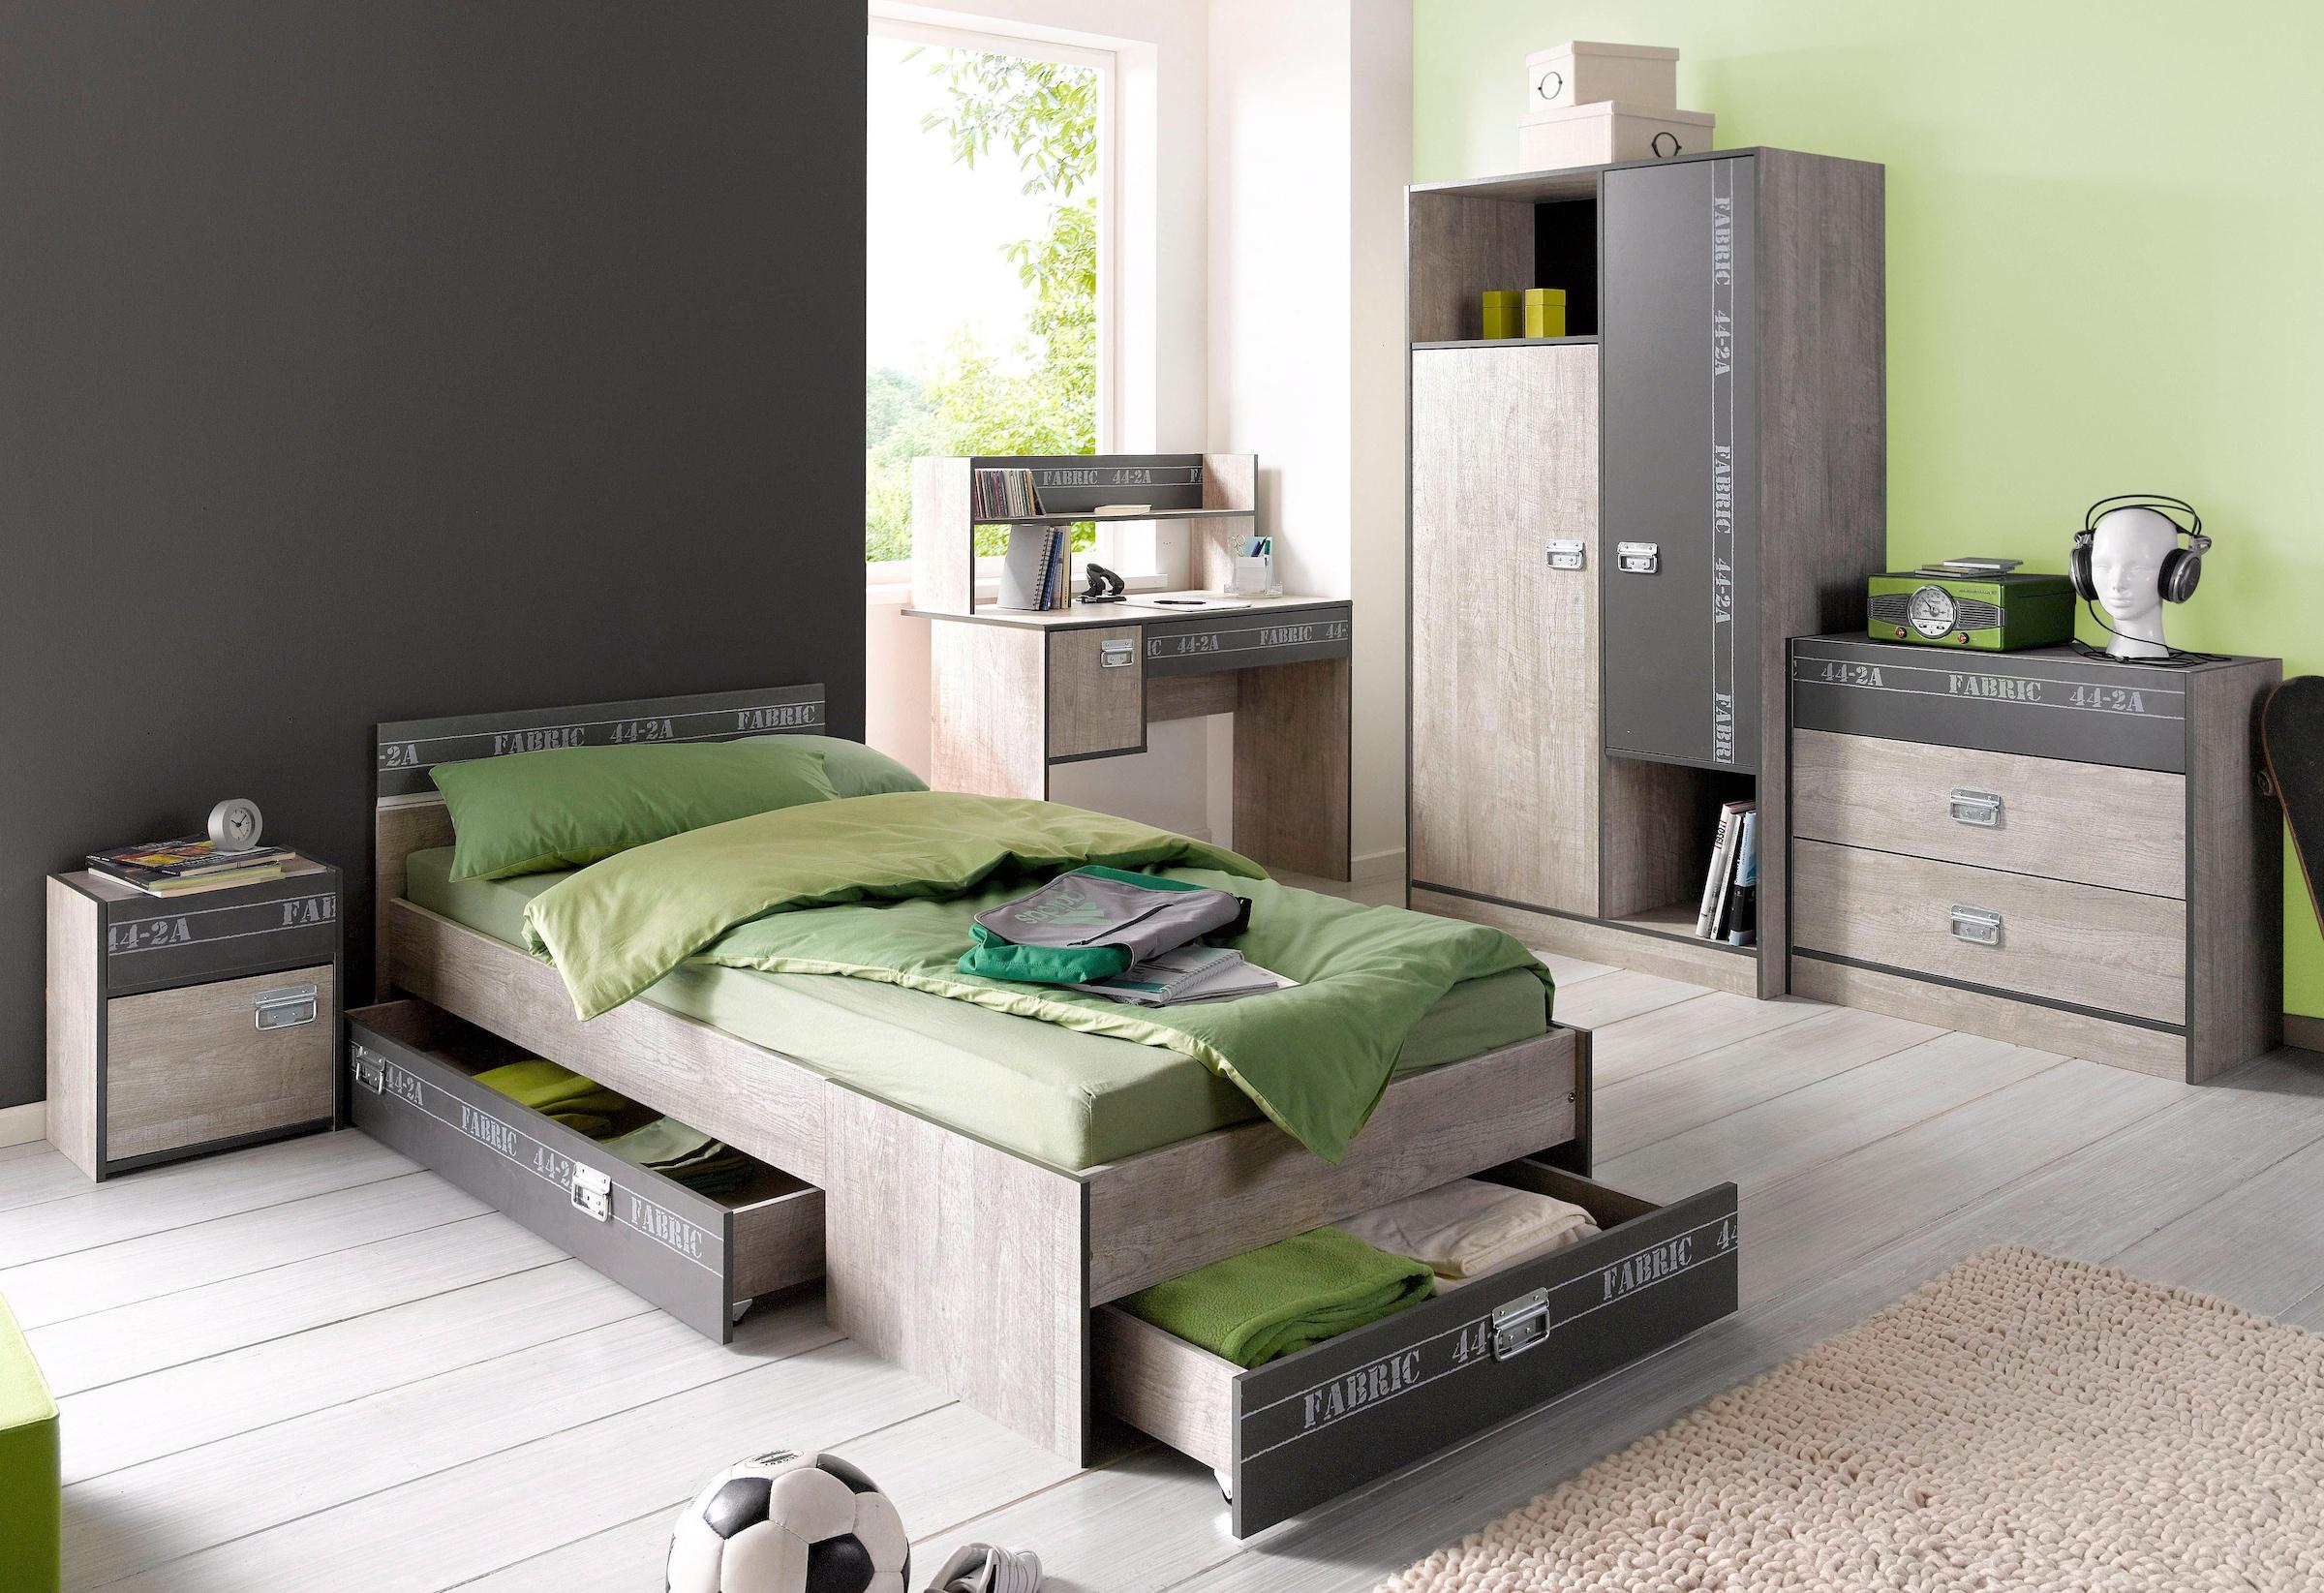 Kinderzimmer Komplett Mit Etagenbett : Möbel für kinderzimmer kinderzimmermöbel online kaufen baur